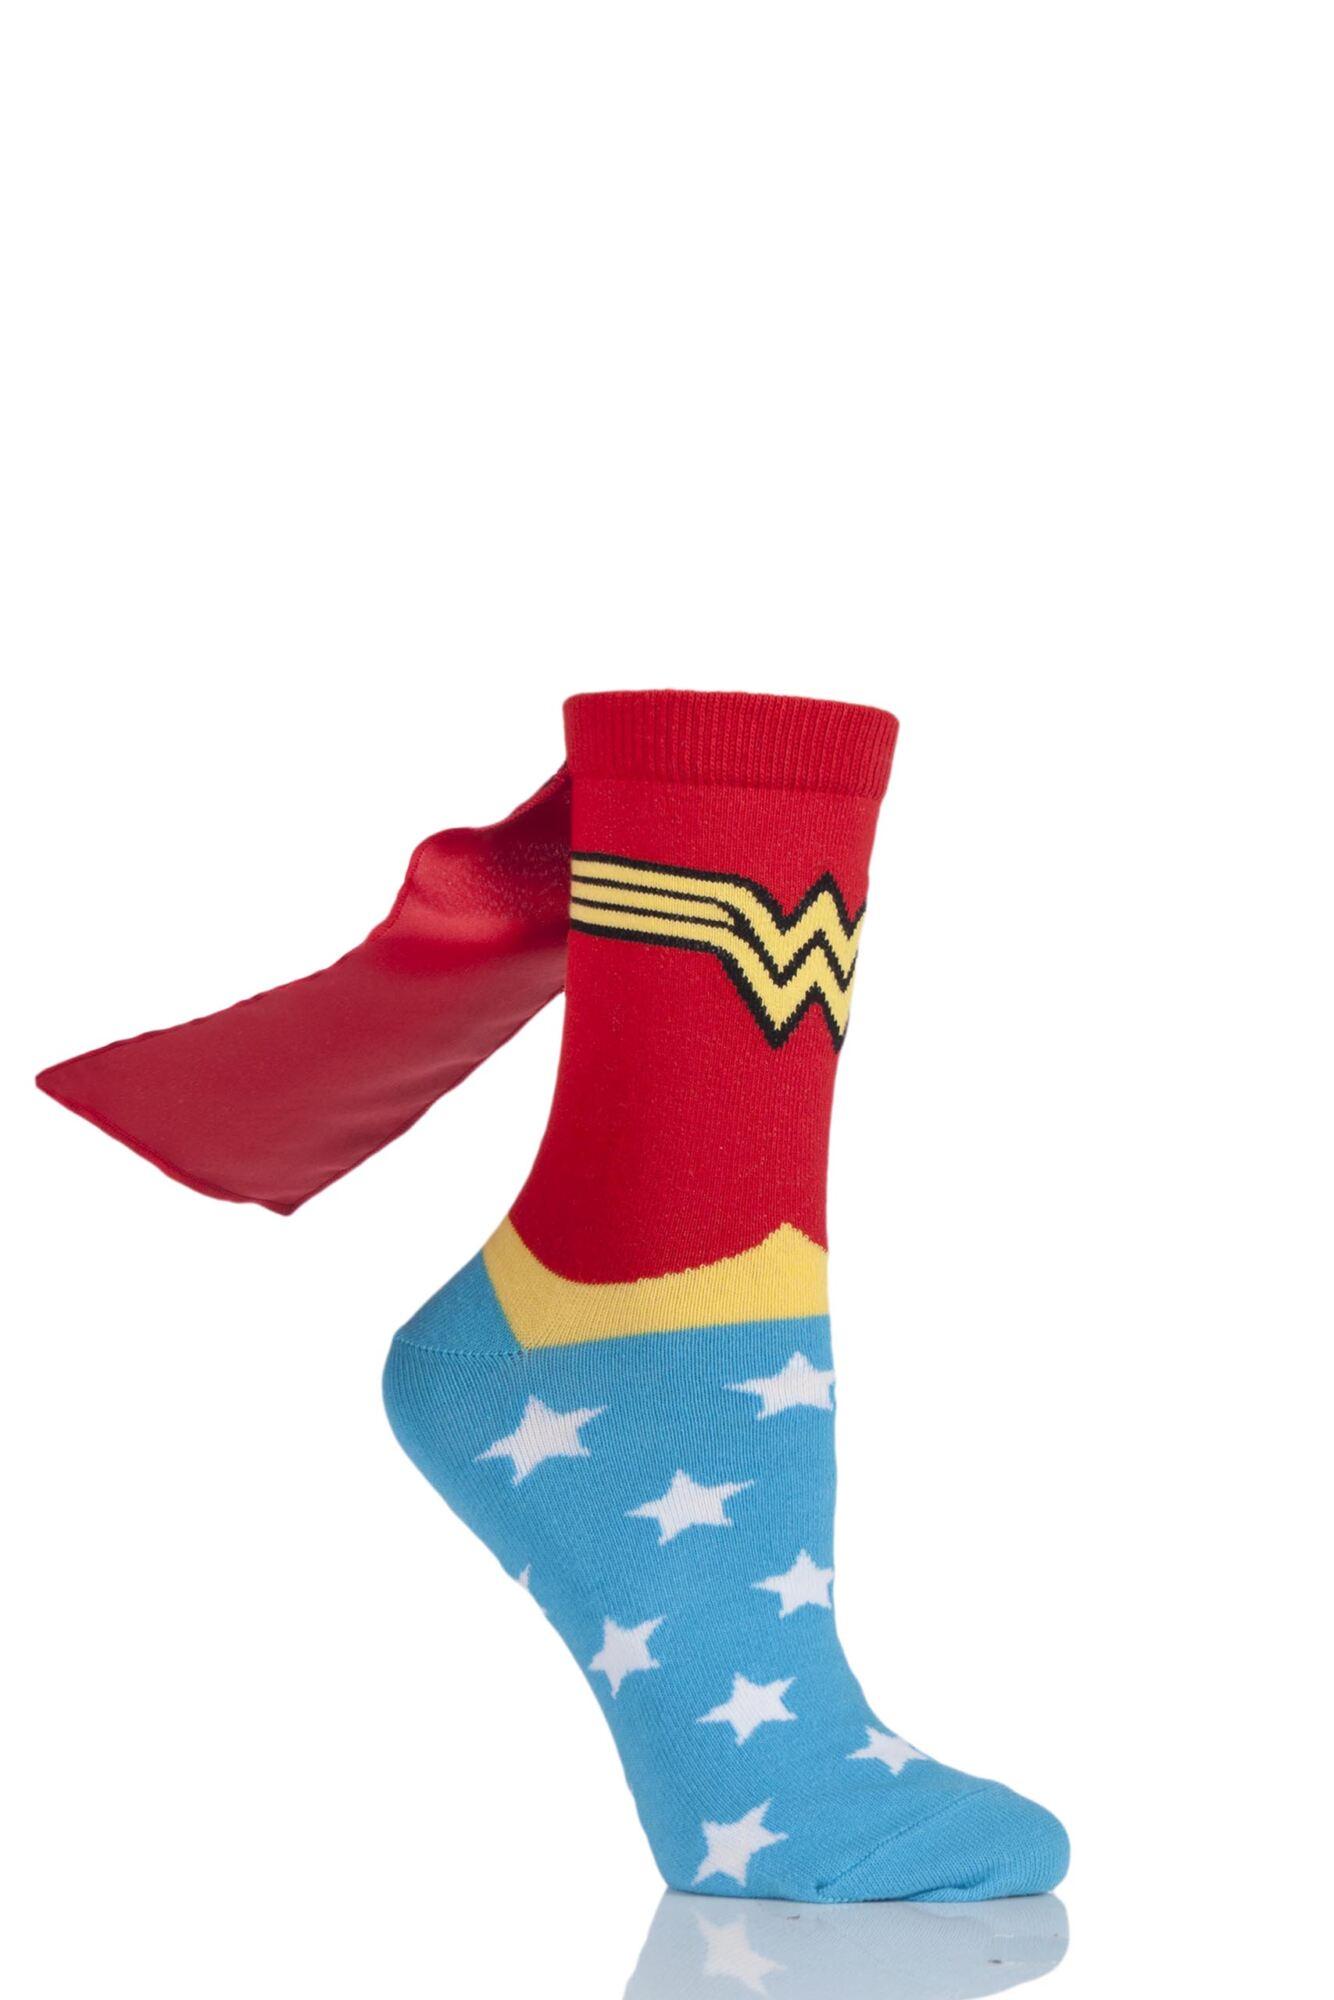 1 Pair DC Comics Wonder Woman Cape Socks Ladies - Film & TV Characters